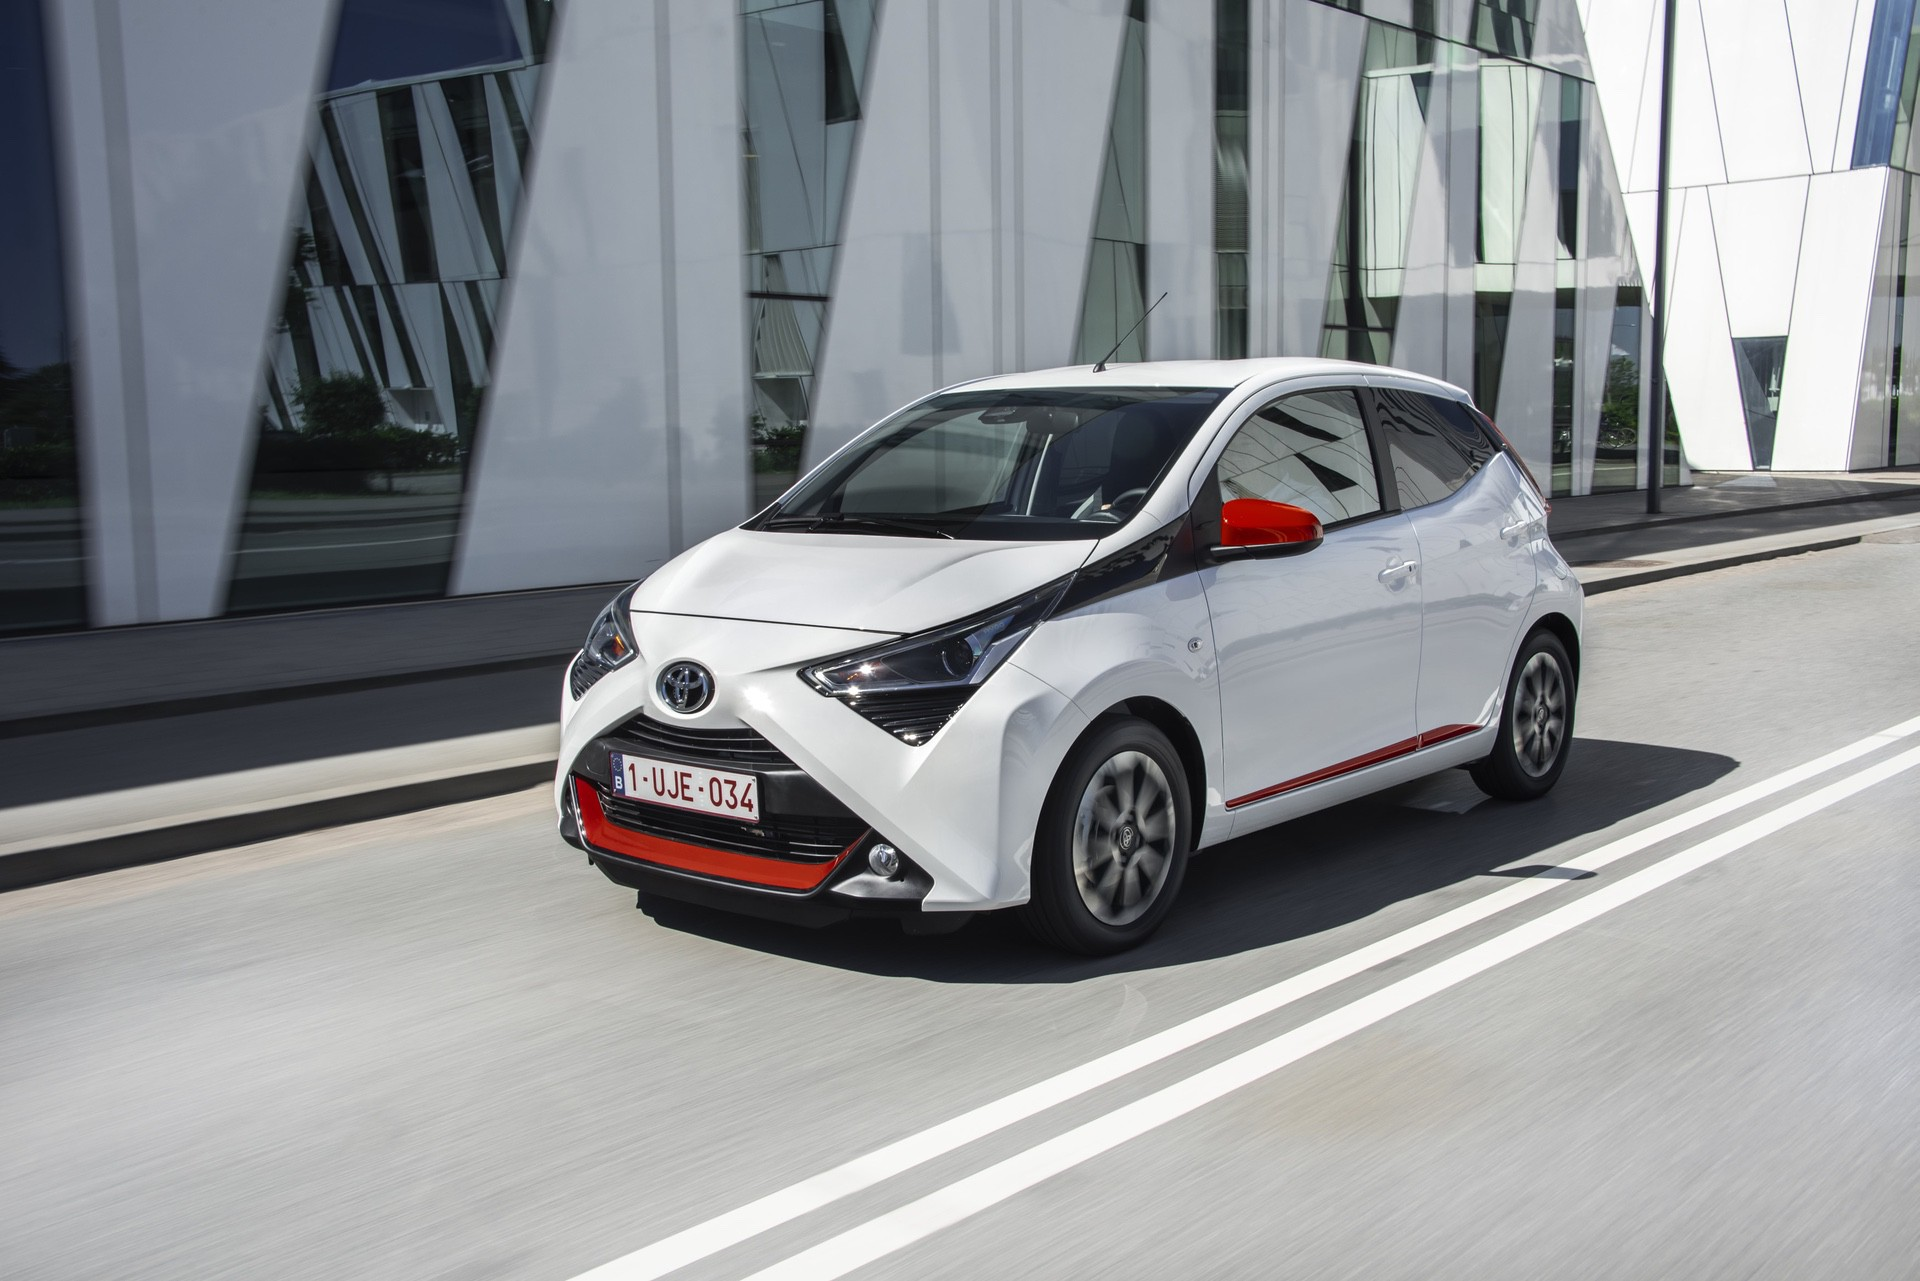 Toyota_Aygo_facelift_presskit_0068